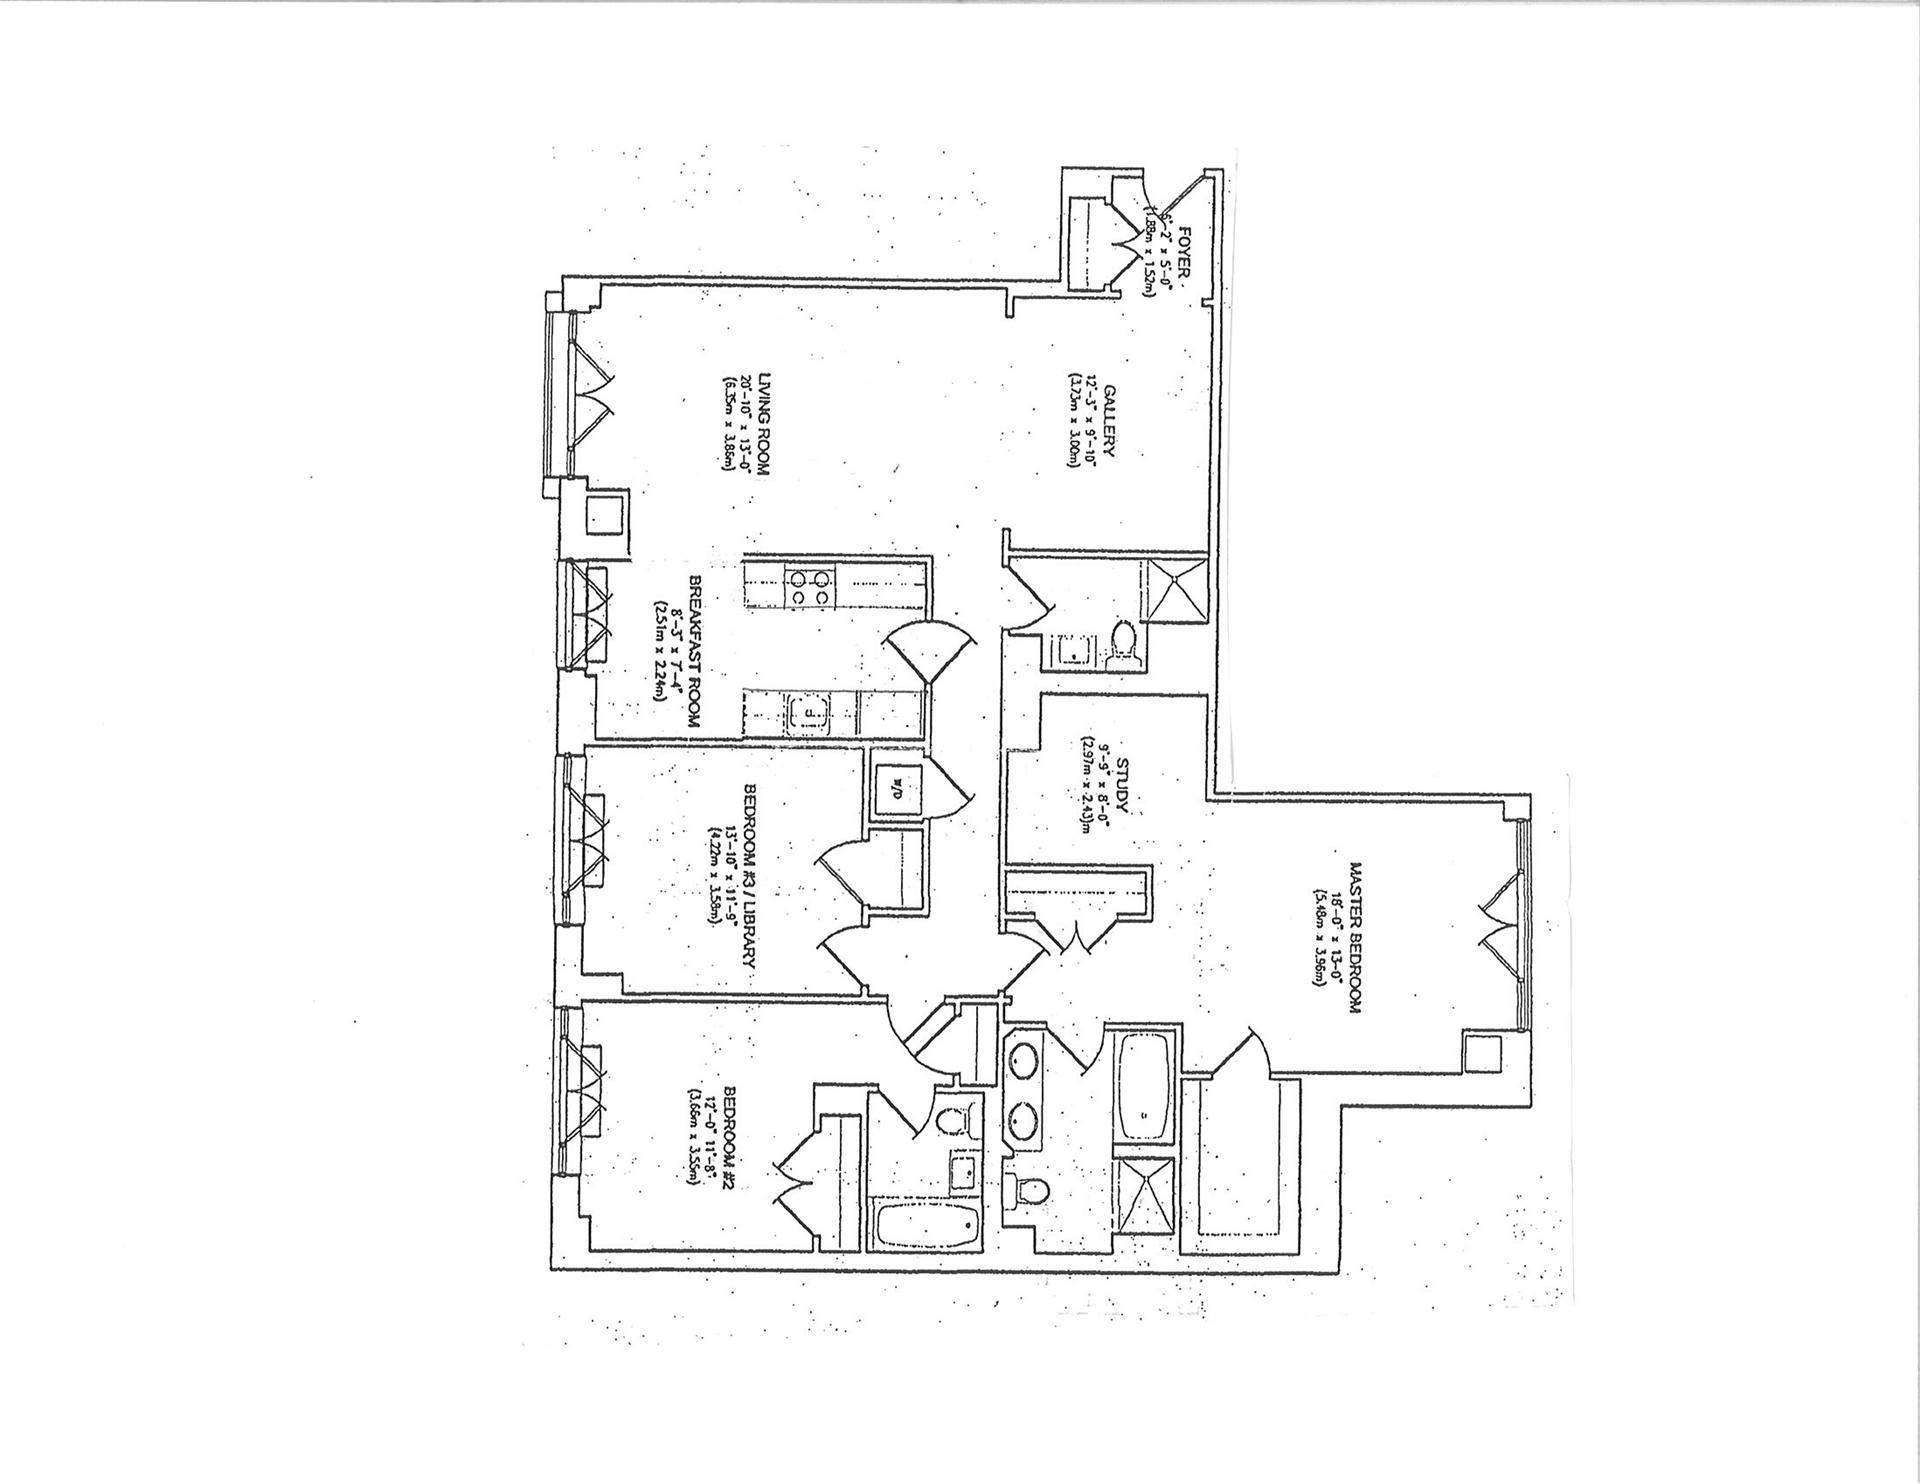 Floor plan of GRAND BEEKMAN, 400 East 51st Street, 5E - Beekman, New York